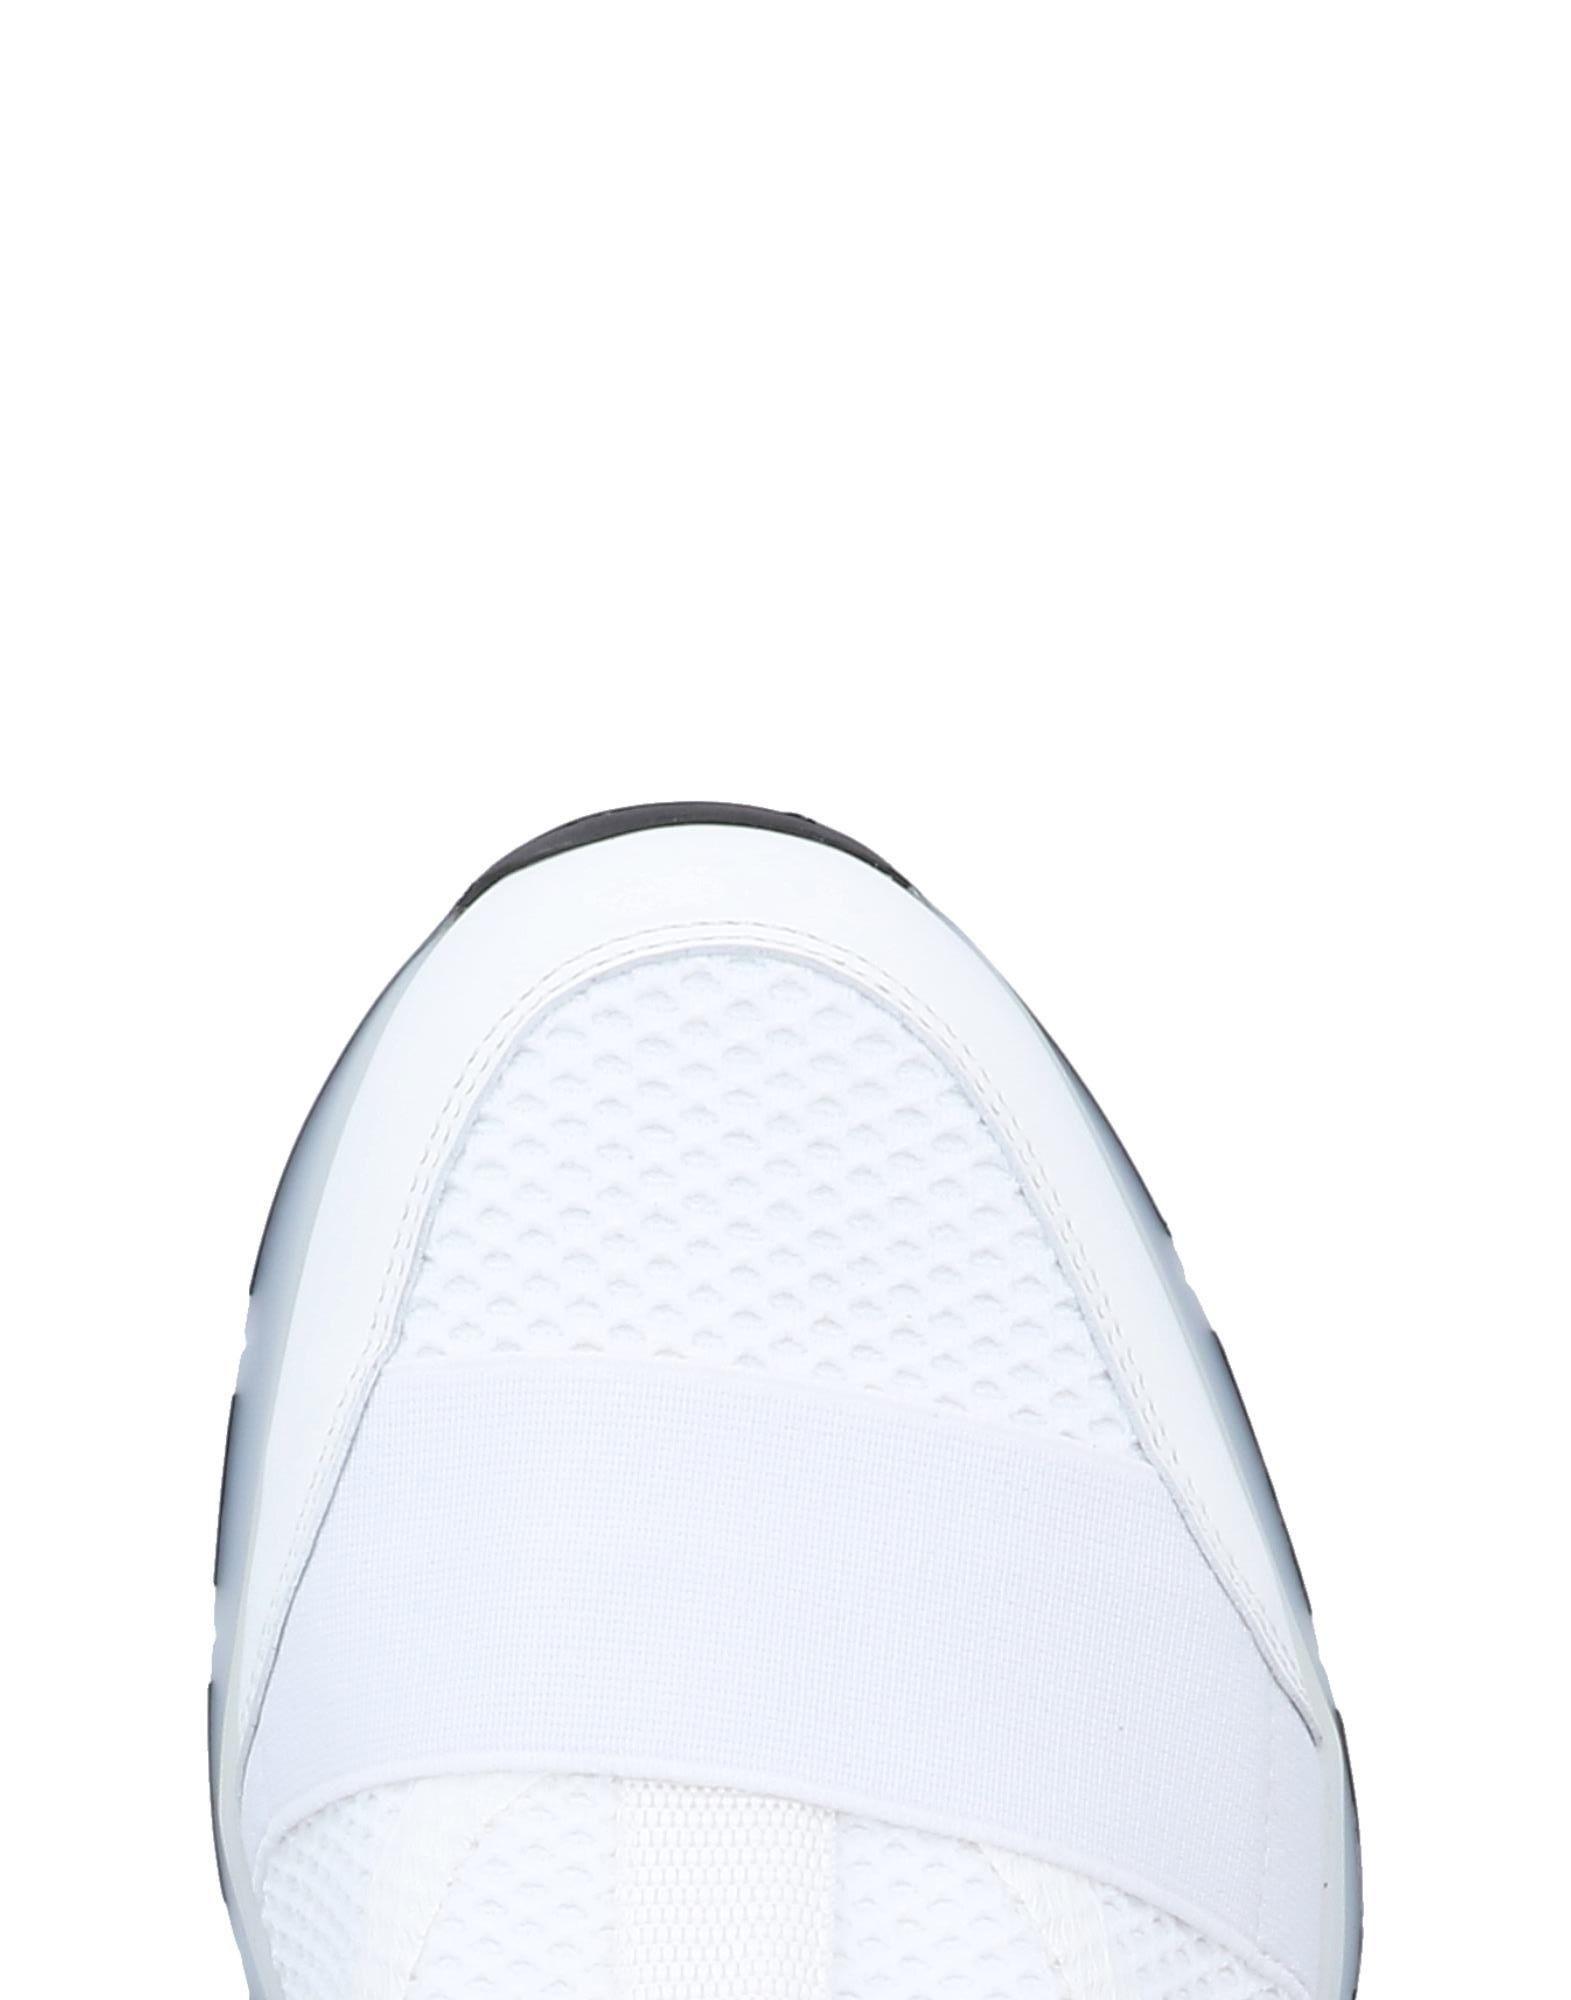 Dior Homme Sneakers Herren beliebte  11462567DV Gute Qualität beliebte Herren Schuhe 188be7